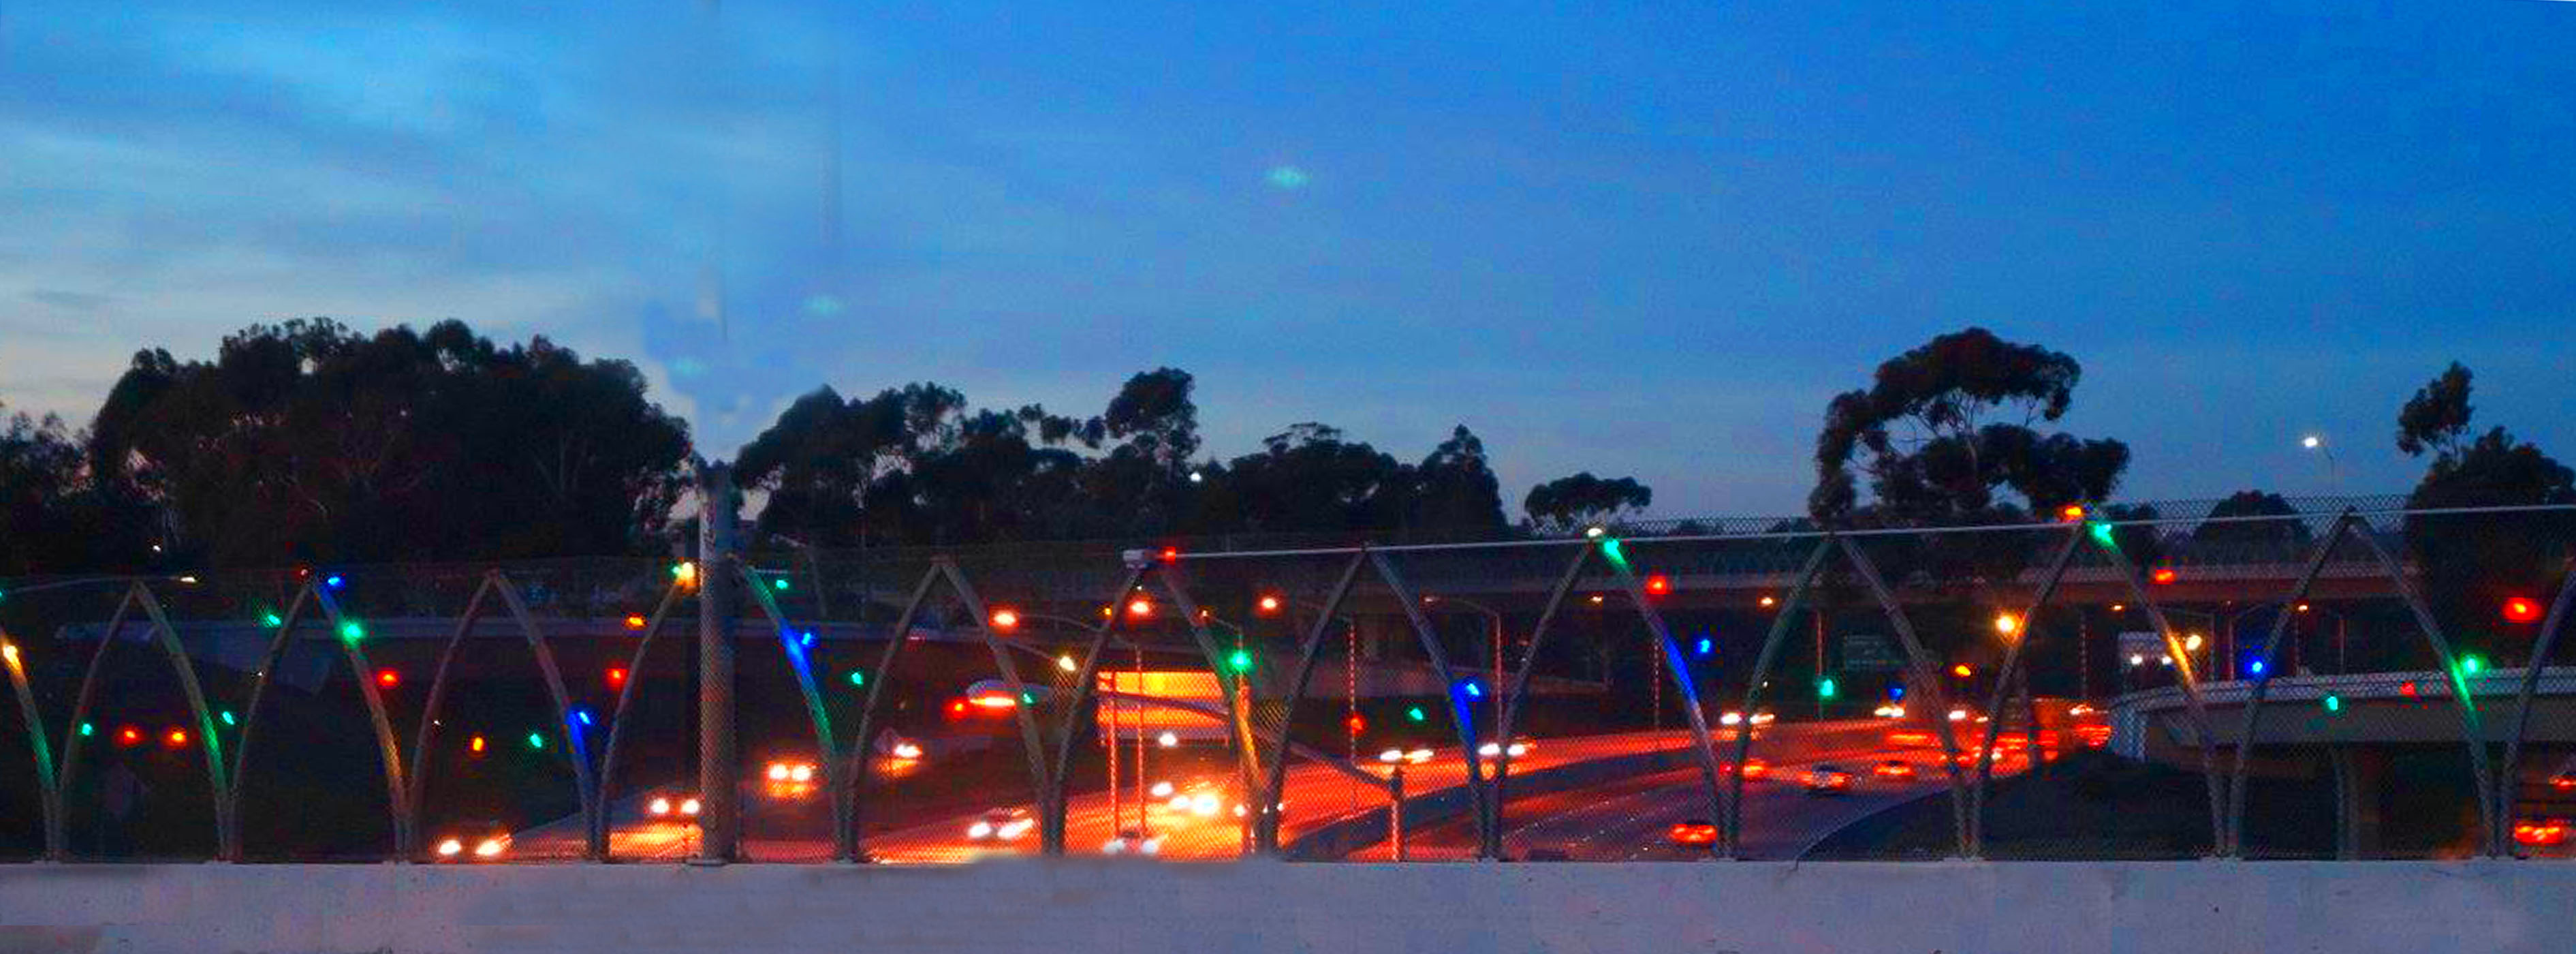 Holiday Bridge Lighting Ceremony